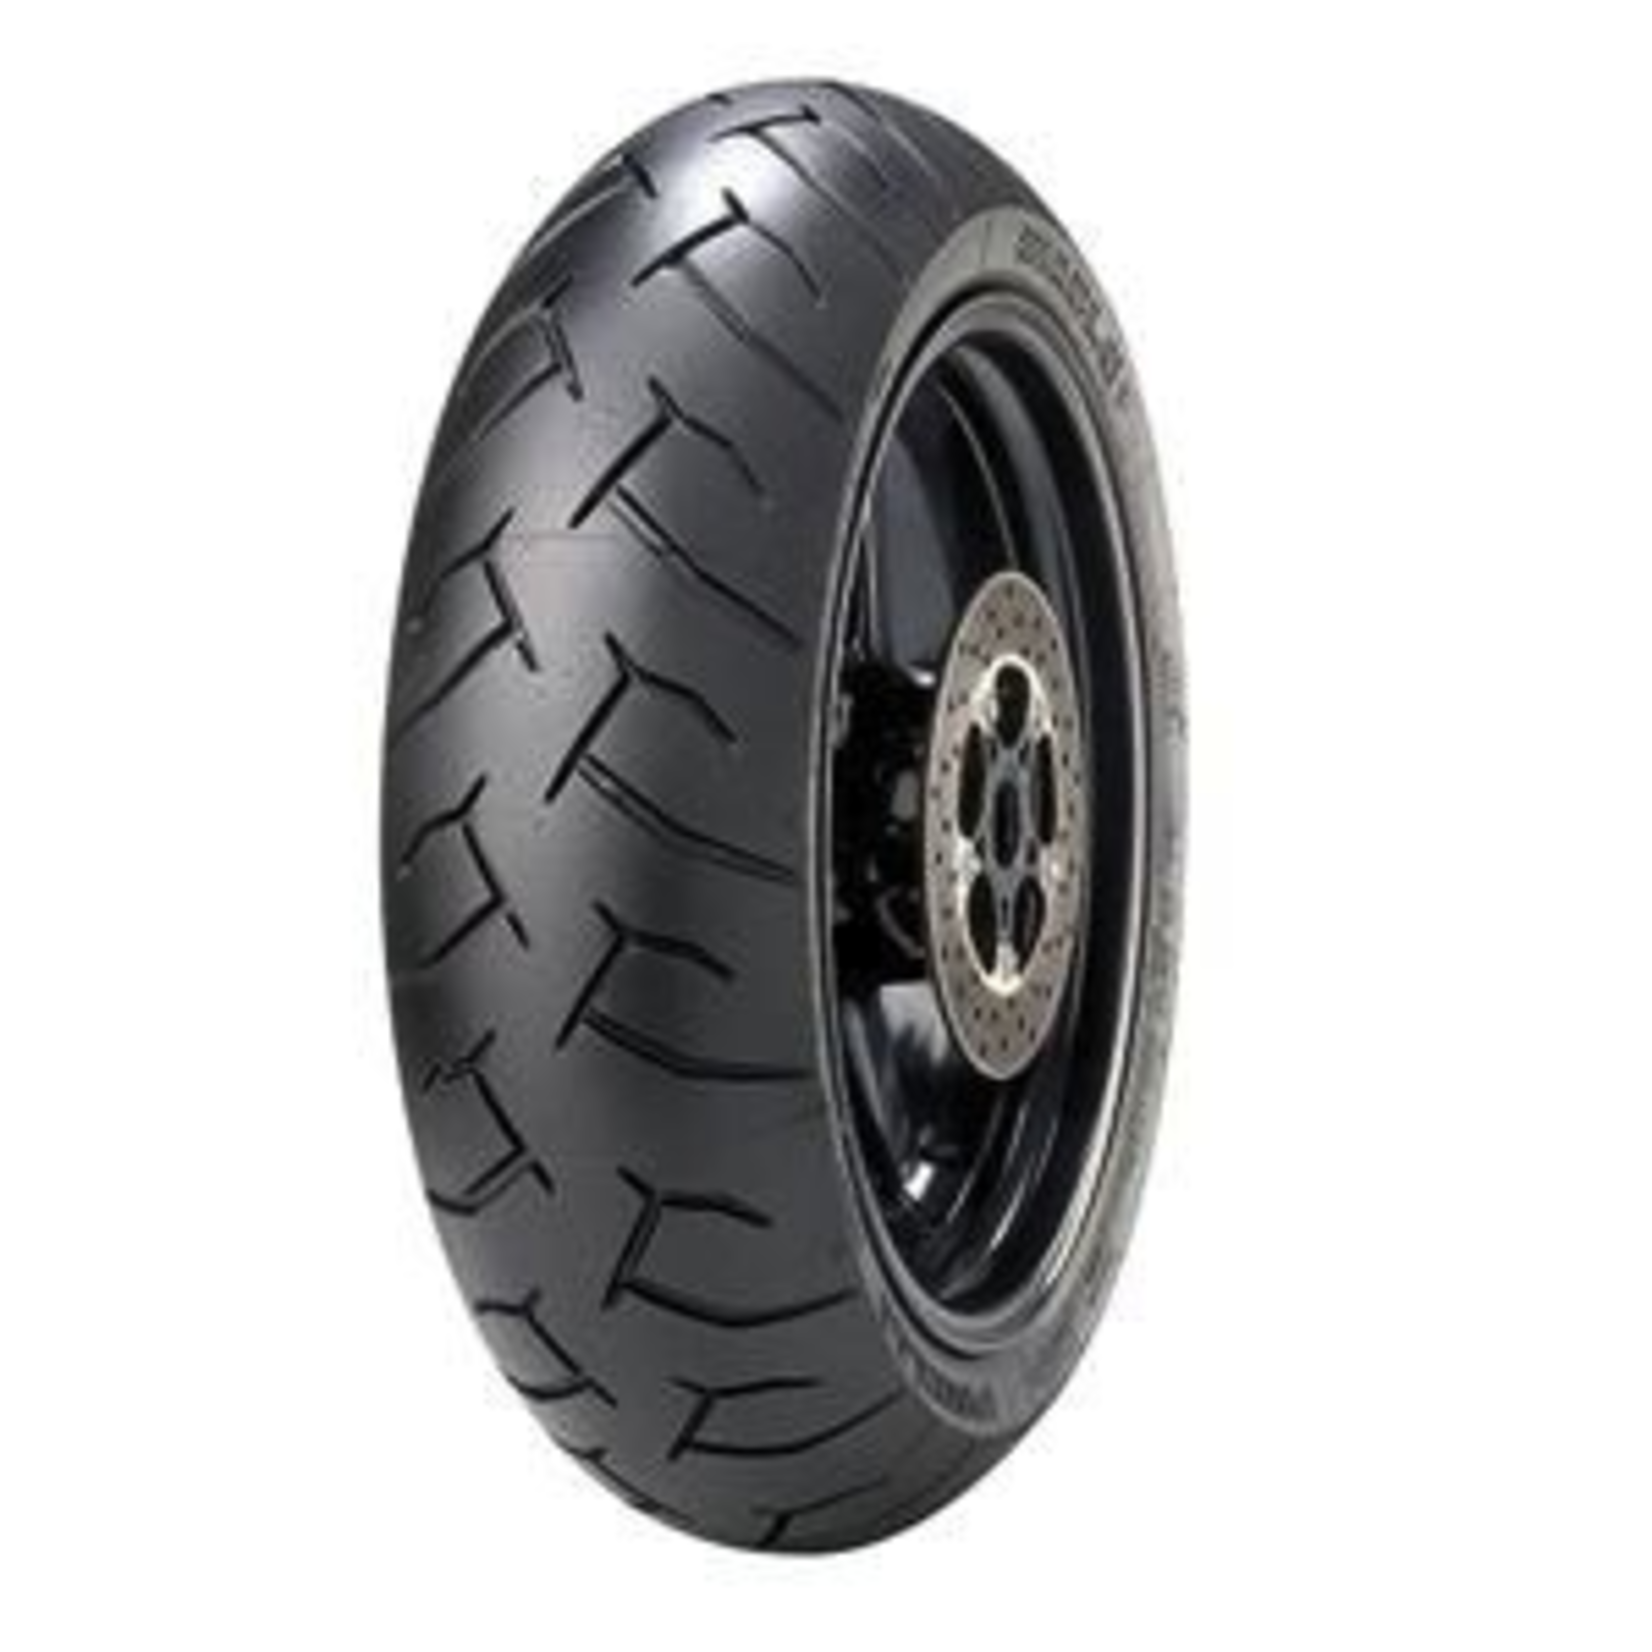 "Parts Tire, 160/60-14"" Pirelli Diablo"